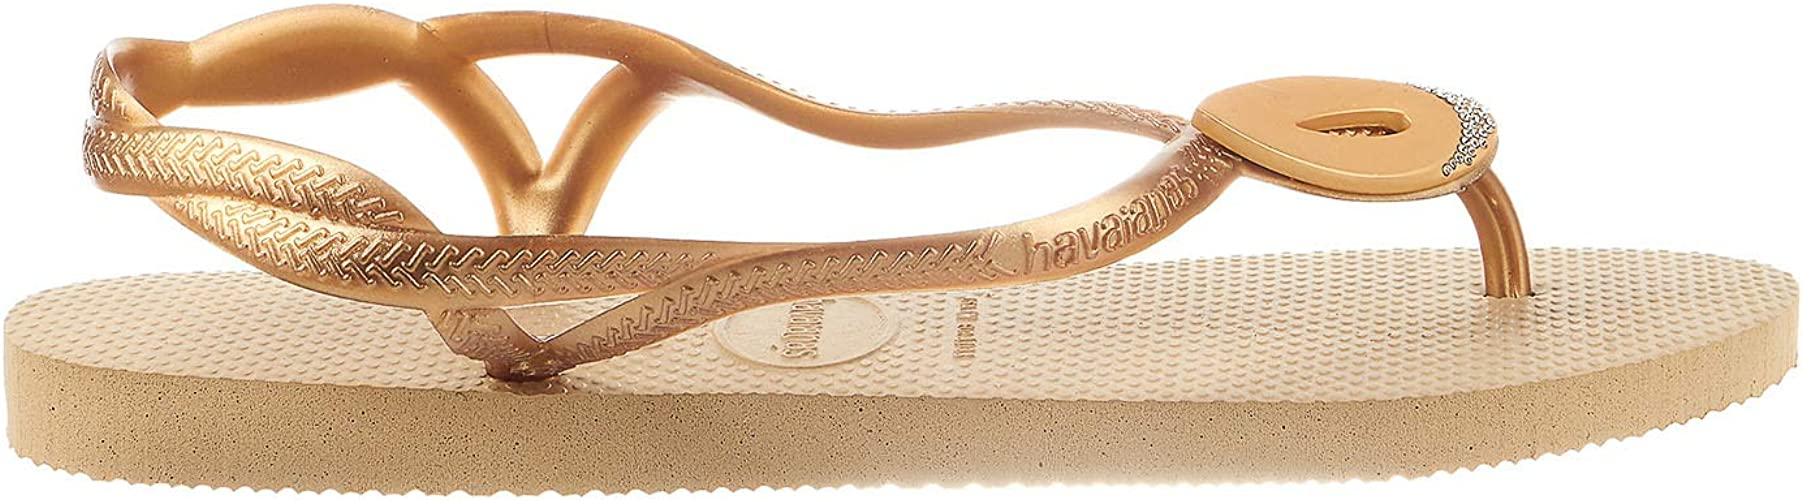 Havaianas Girls Sandals  Luna Rose Gold Flip Flops Summer Shoes